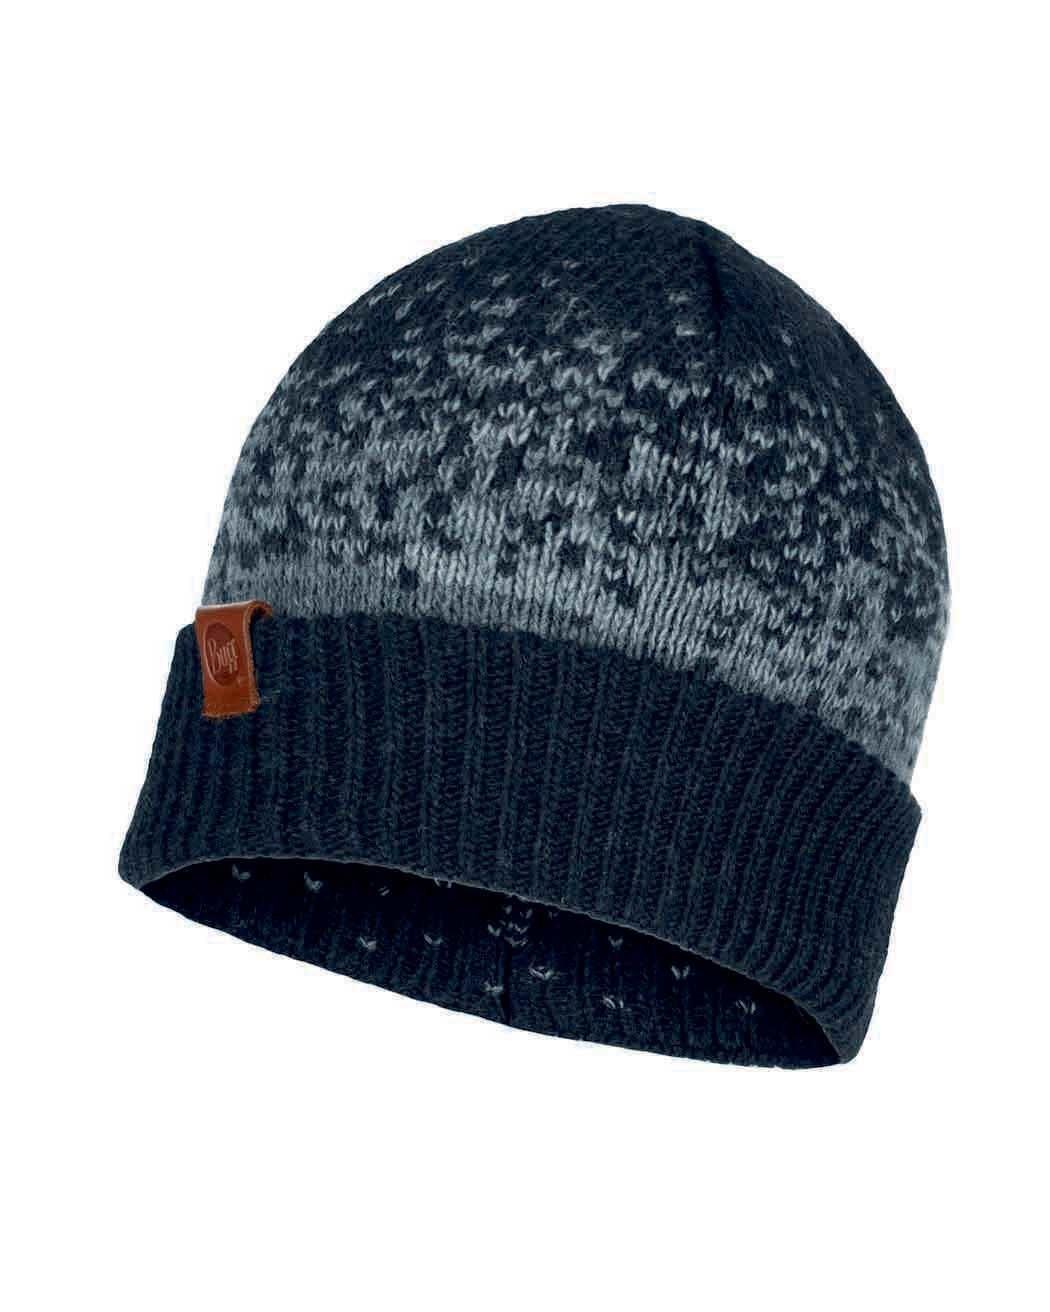 Шапки средней вязки Вязаная шапка Buff Hat Knitted Valter Graphite 117890.901.10.00.jpg